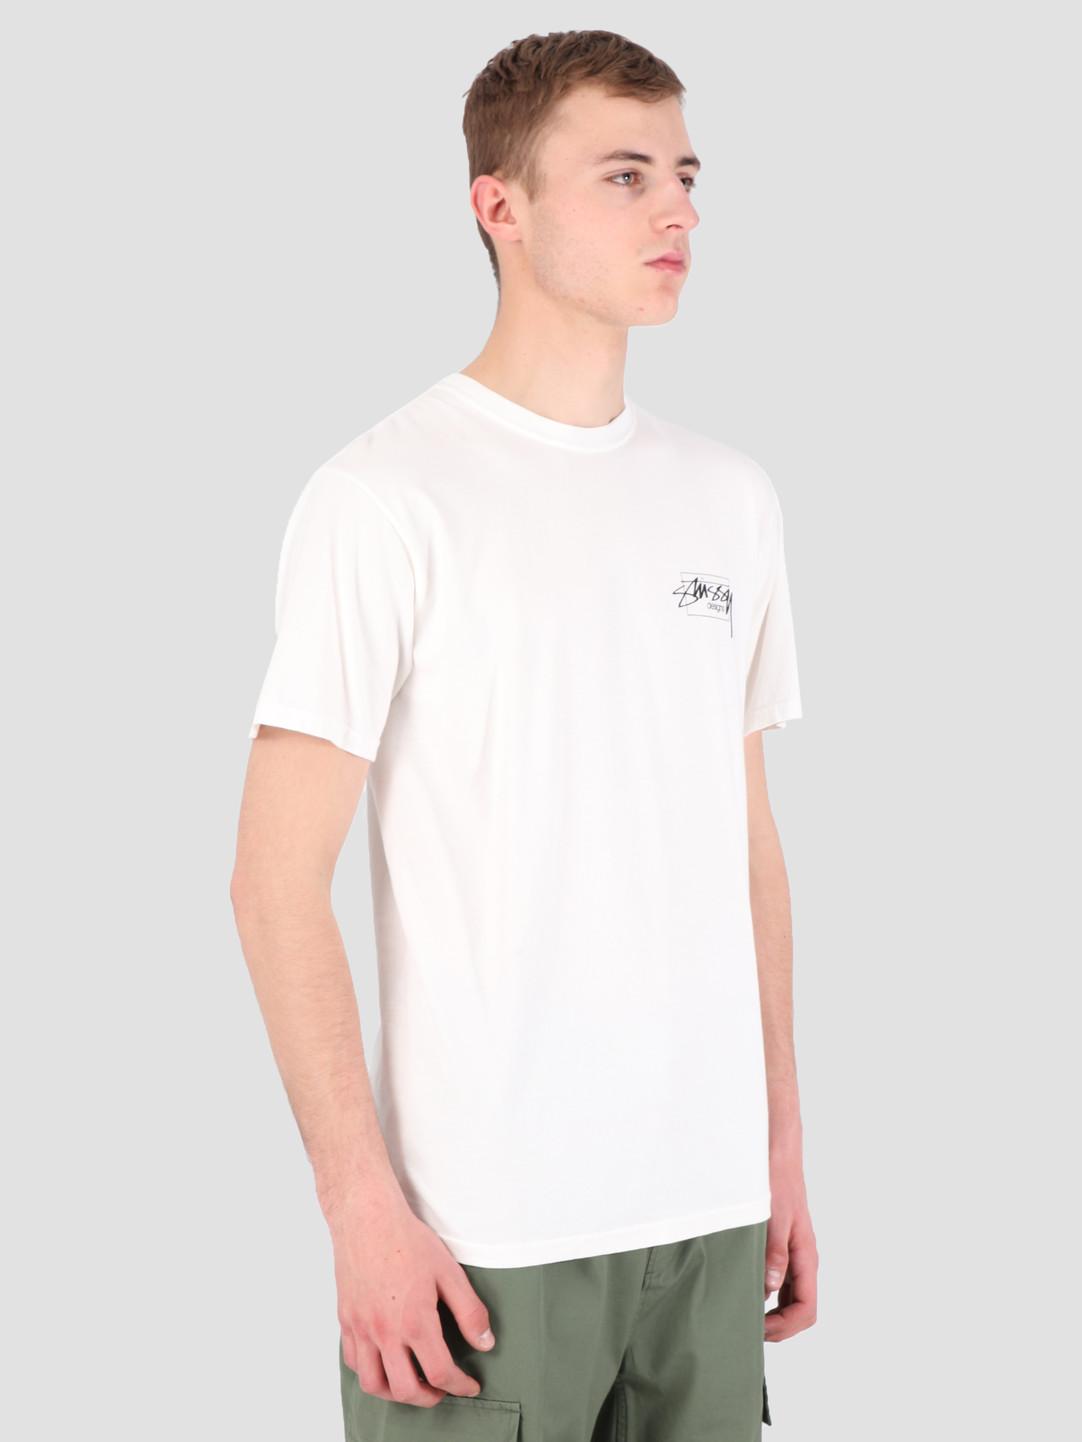 Stussy Stussy Modern Age Pig. Dyed T-Shirt Natural 1002